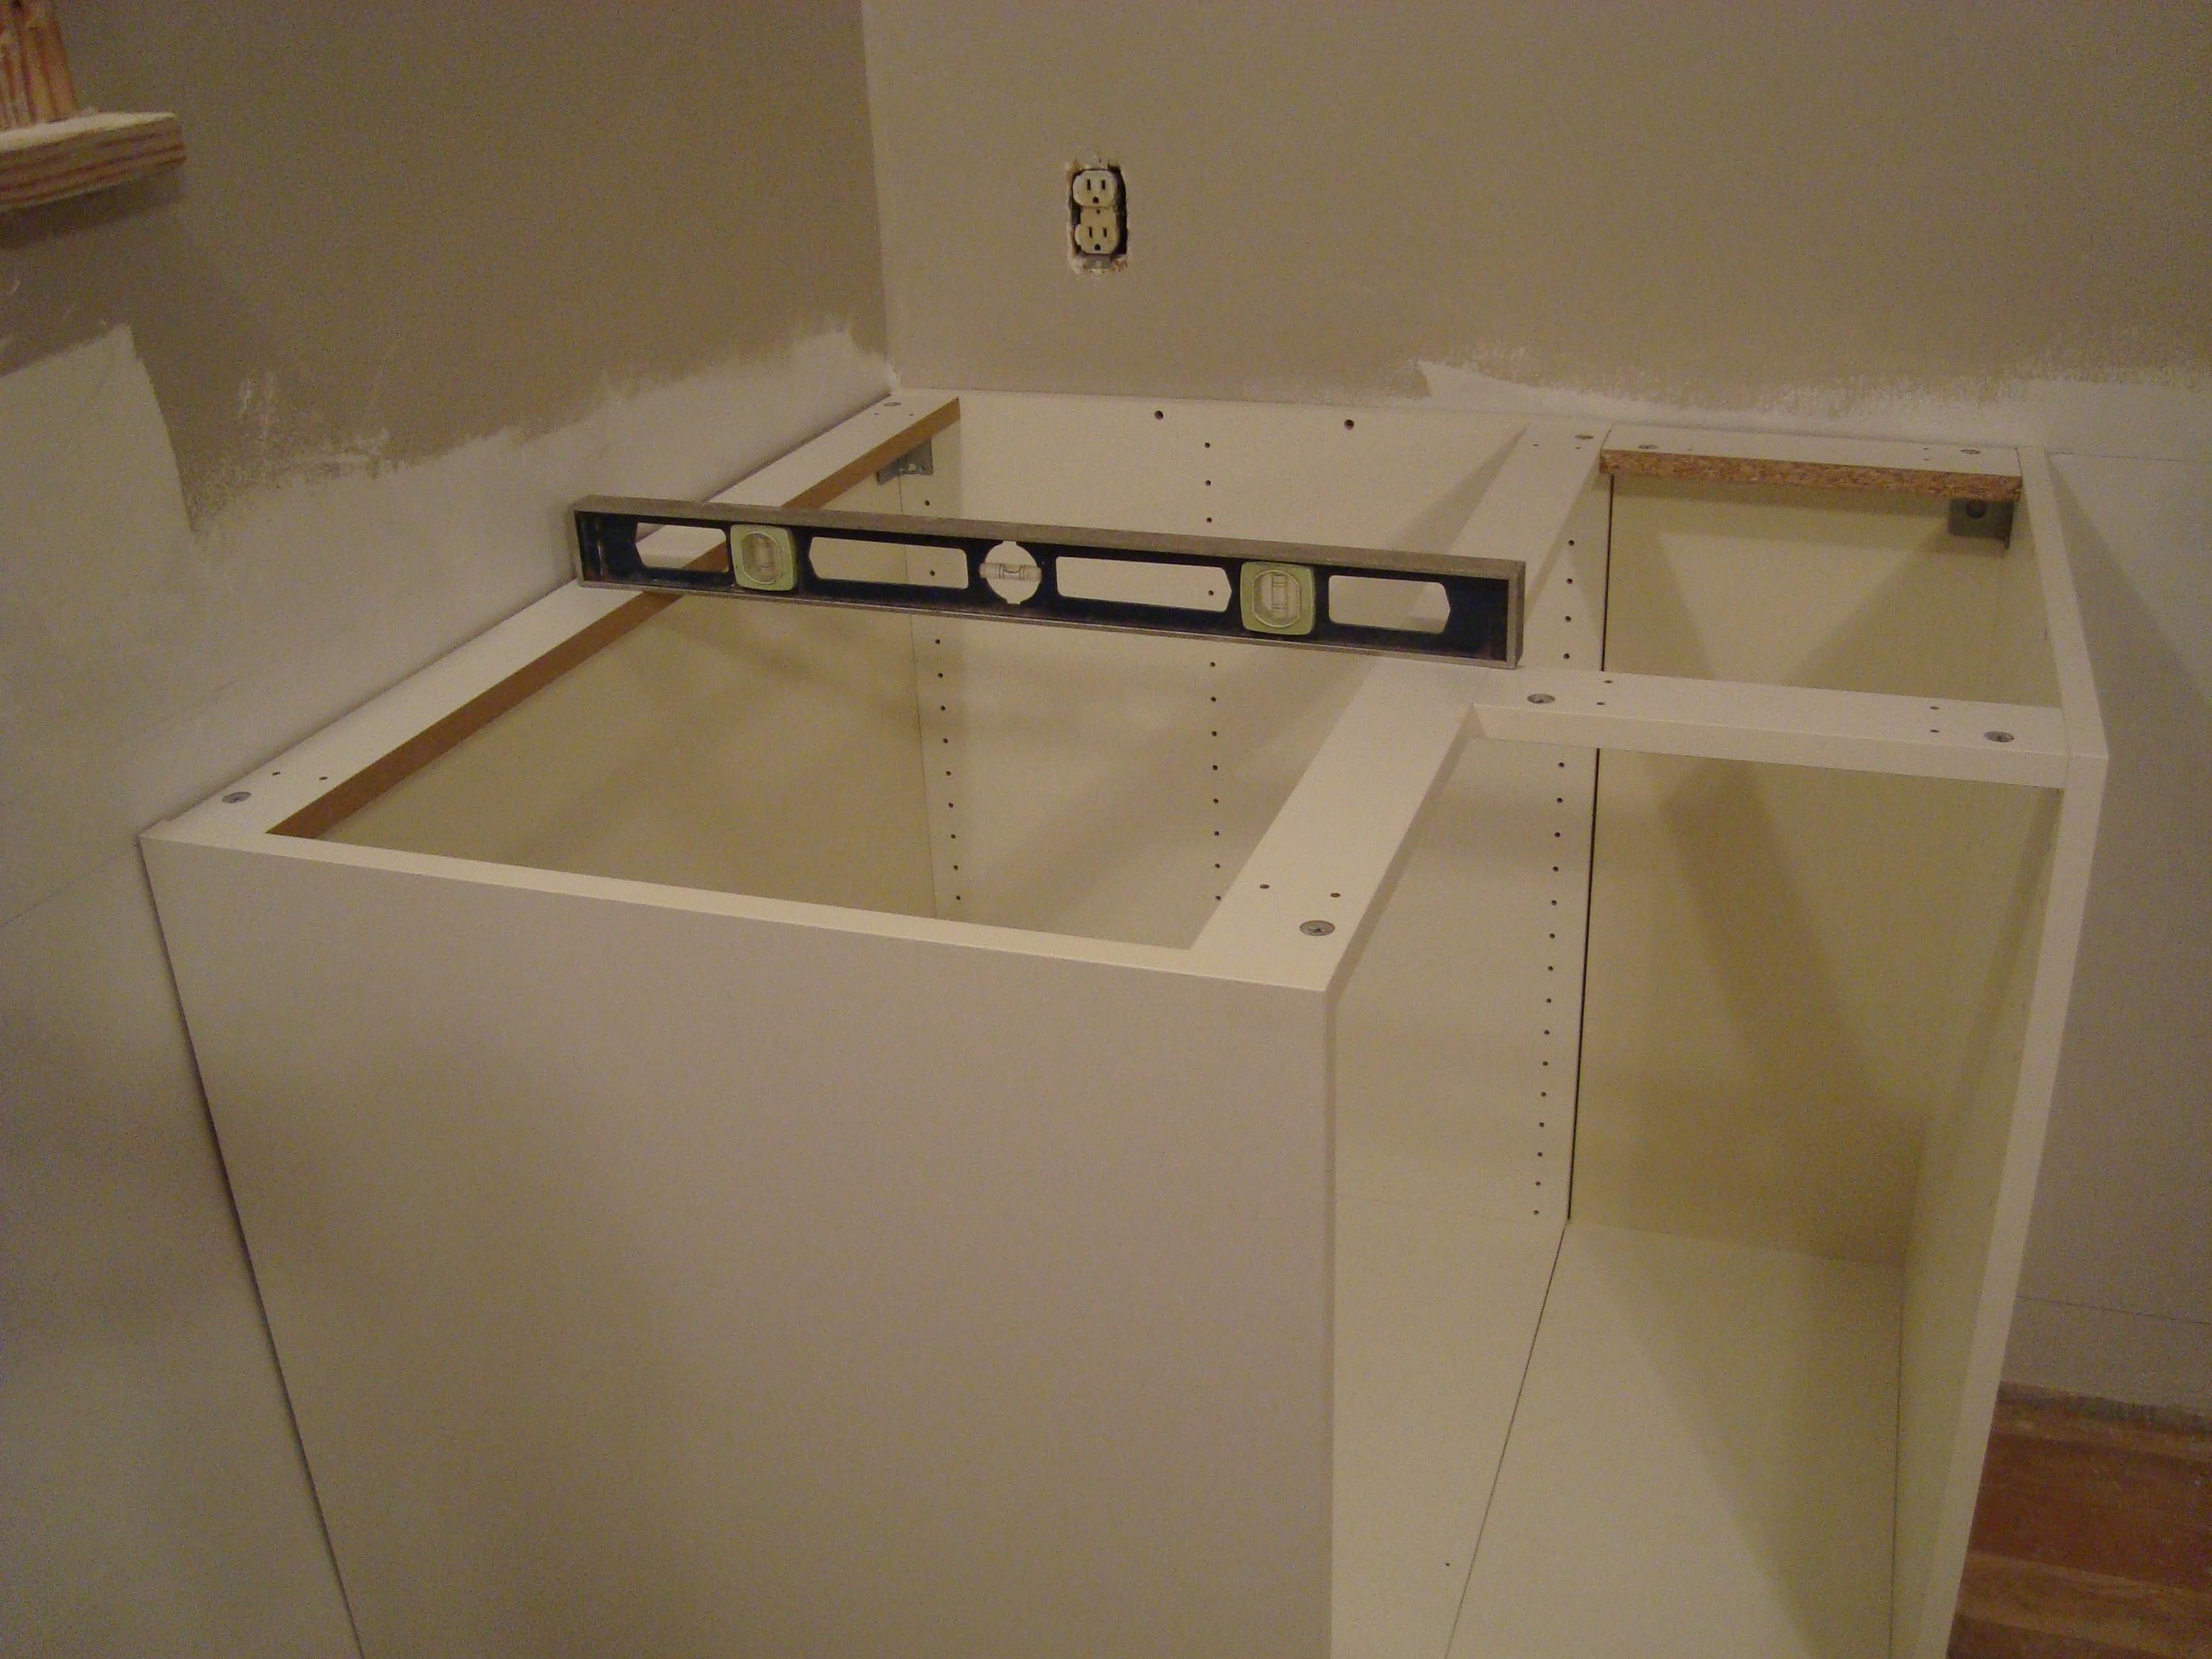 an och 10 step program installing kitchen cabinets kitchen sink base cabinet Step 7 Cut openings for plumbing in sink base